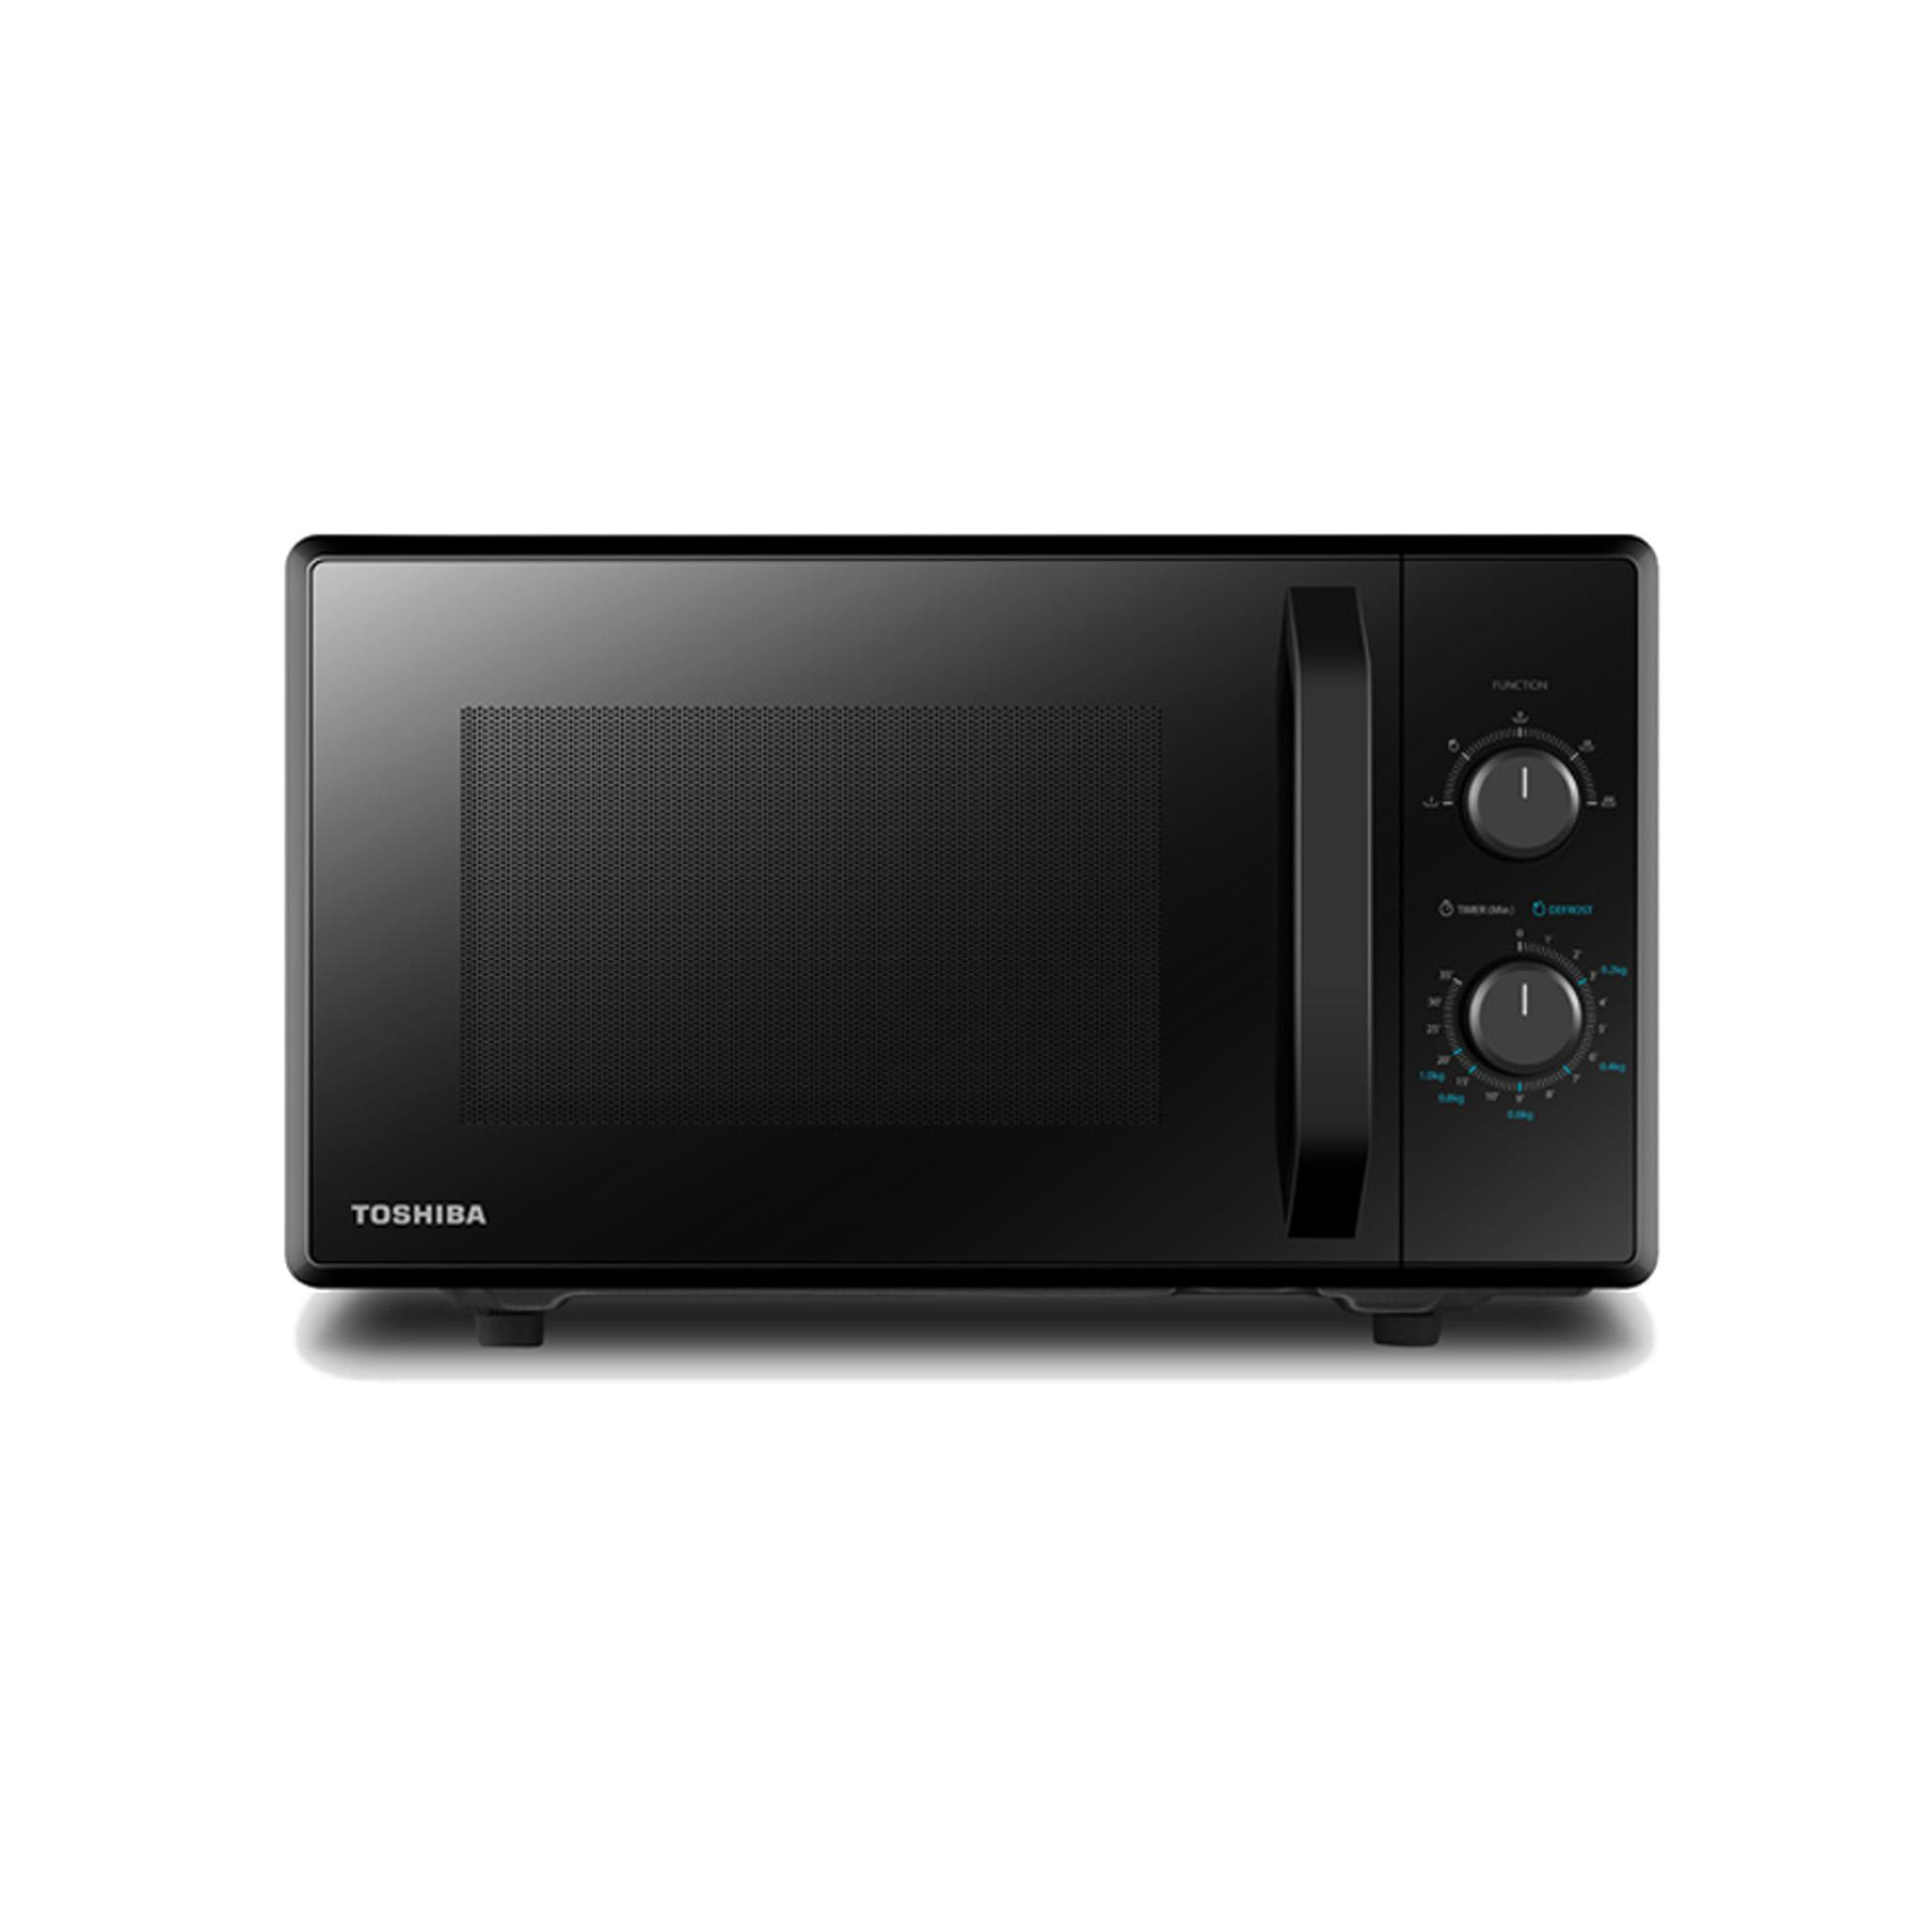 Toshiba 21L Microwave Oven pemanas lauk MW2-MM21PF(BK)